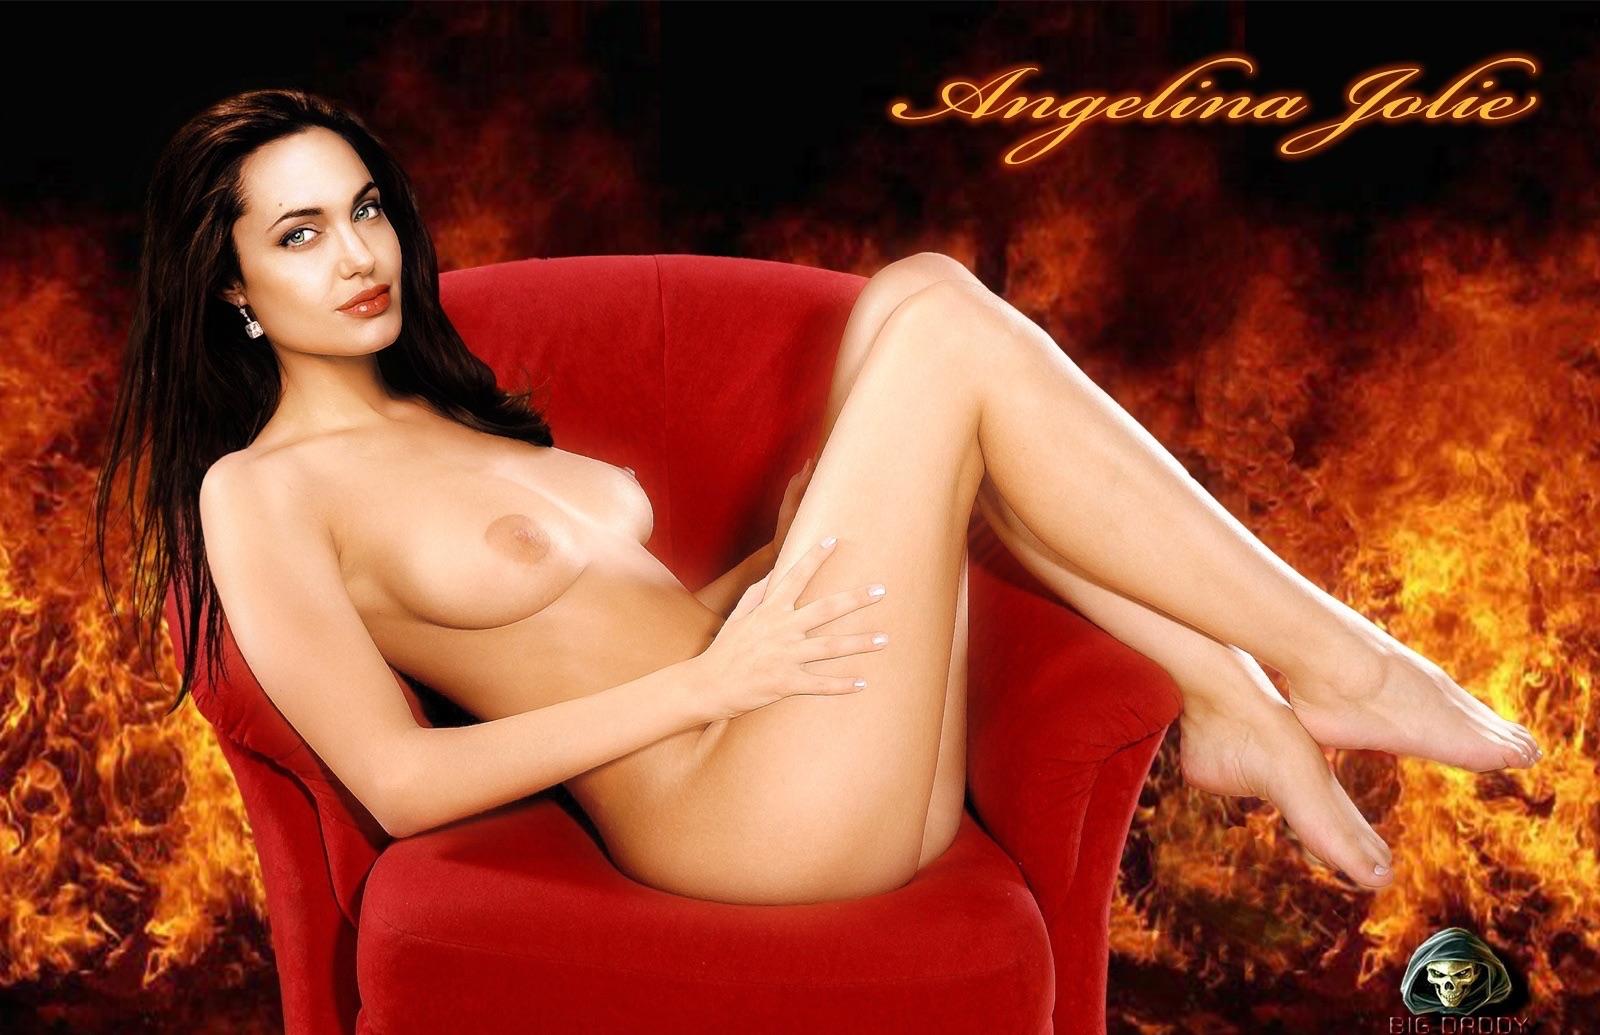 Nude pics of angelina jolie, thin black girl fucking